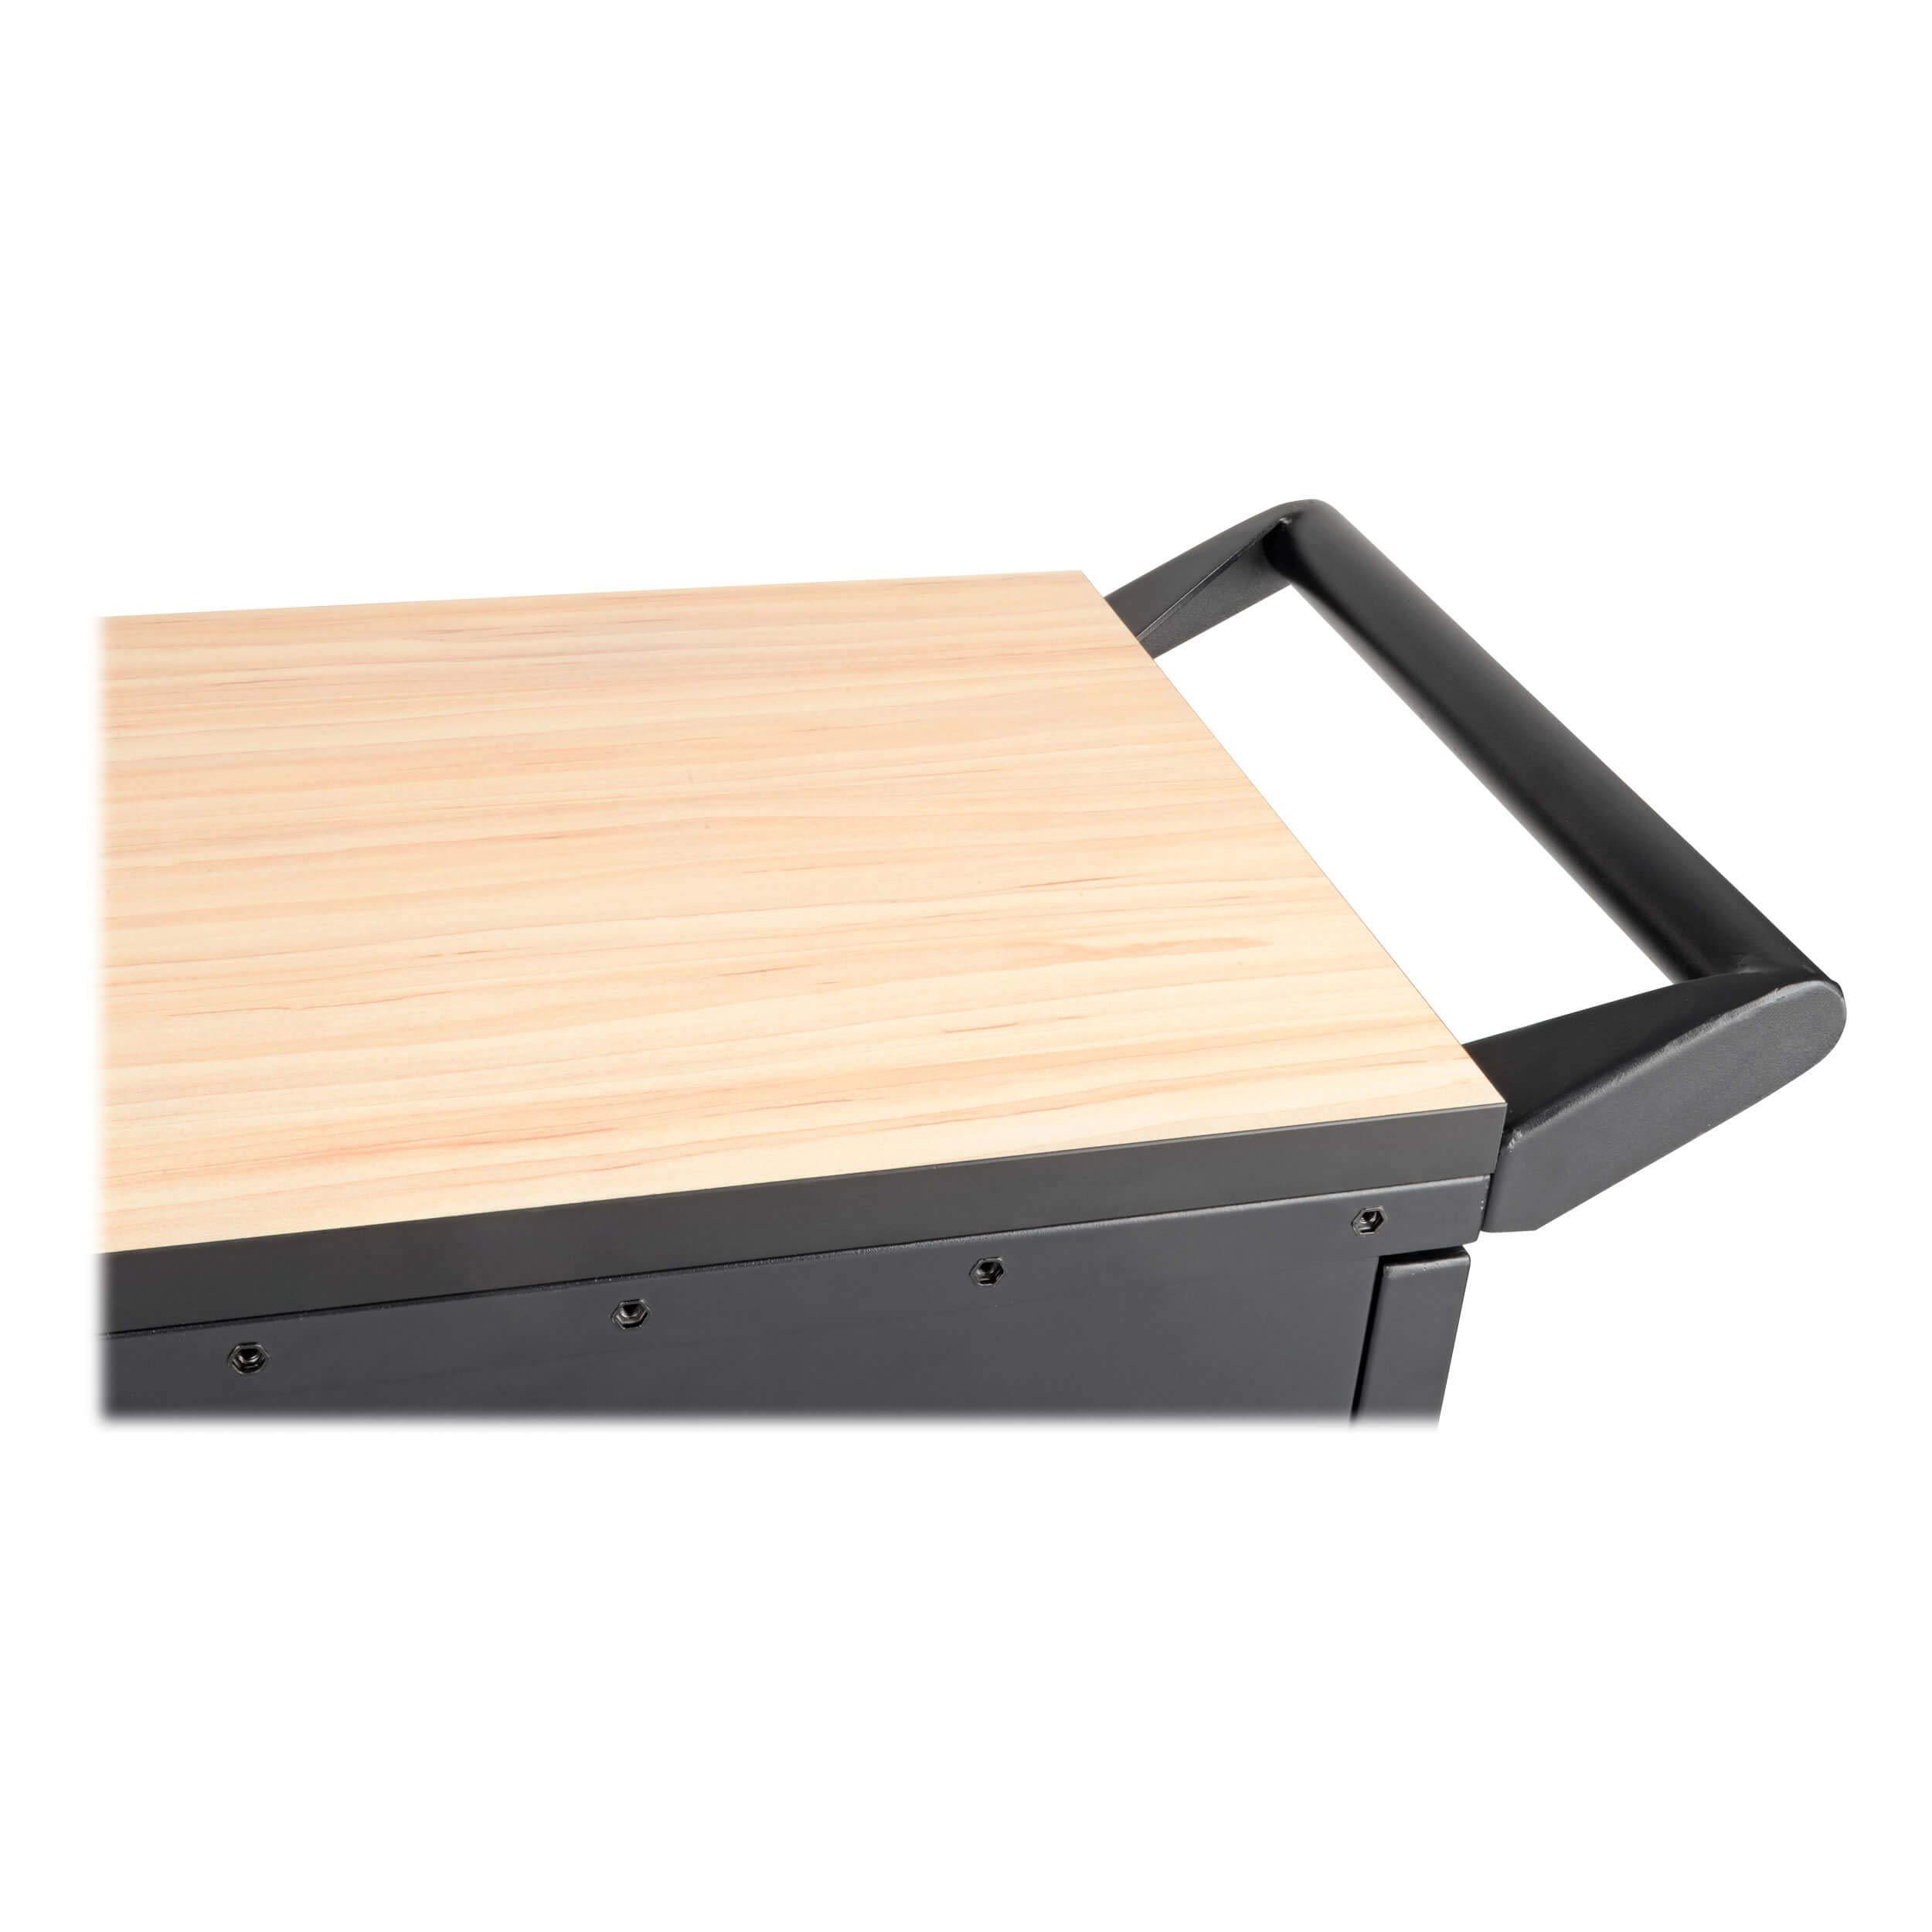 Tripp Lite 27-Port AC Mobile Charging Cart Storage Station for Chromebooks, iPads, Laptops, Tablets, Black (CSC27AC) by Tripp Lite (Image #7)